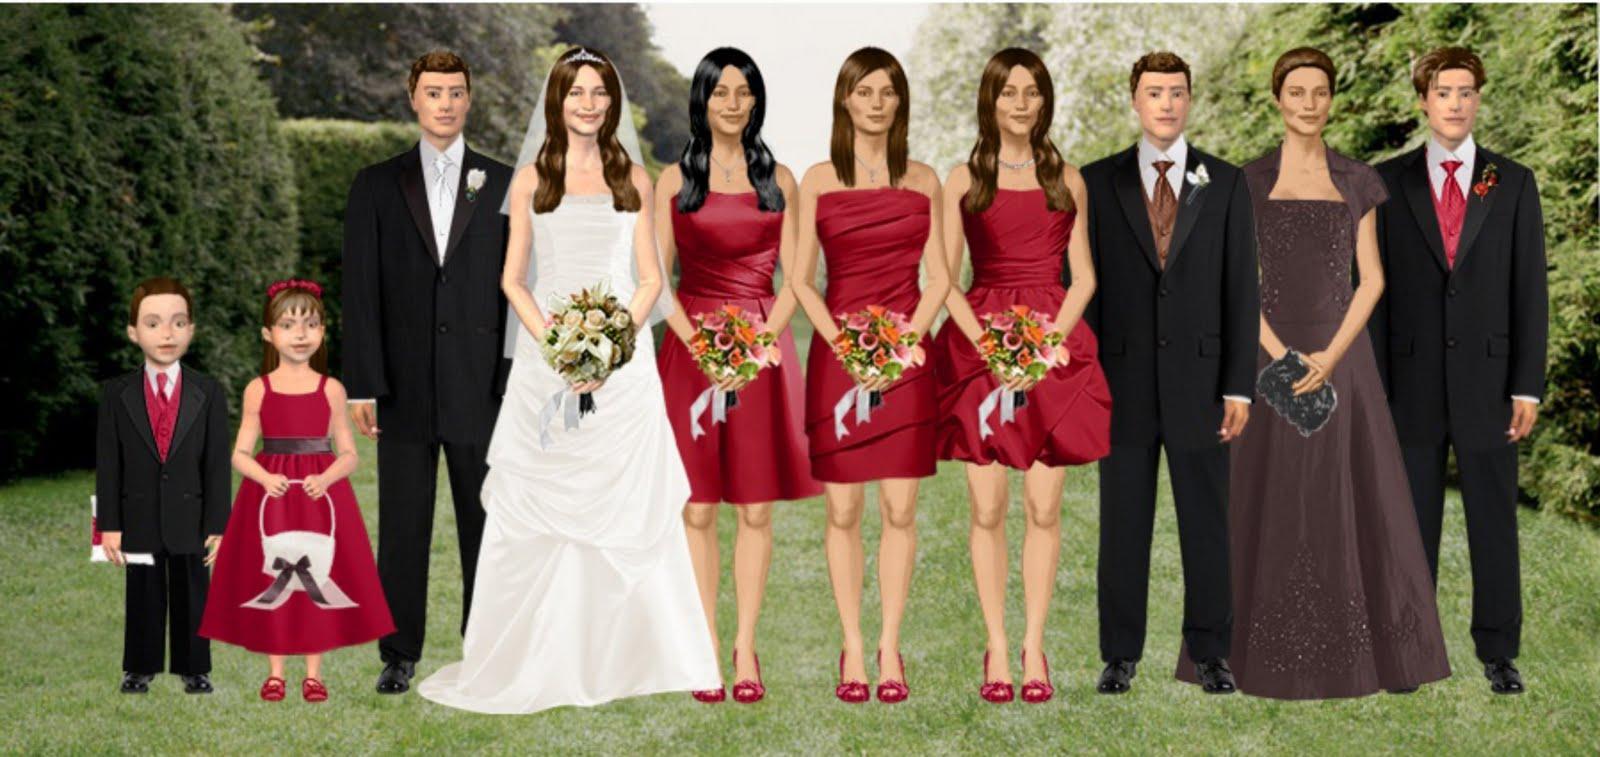 May Wedding Dress Ideas